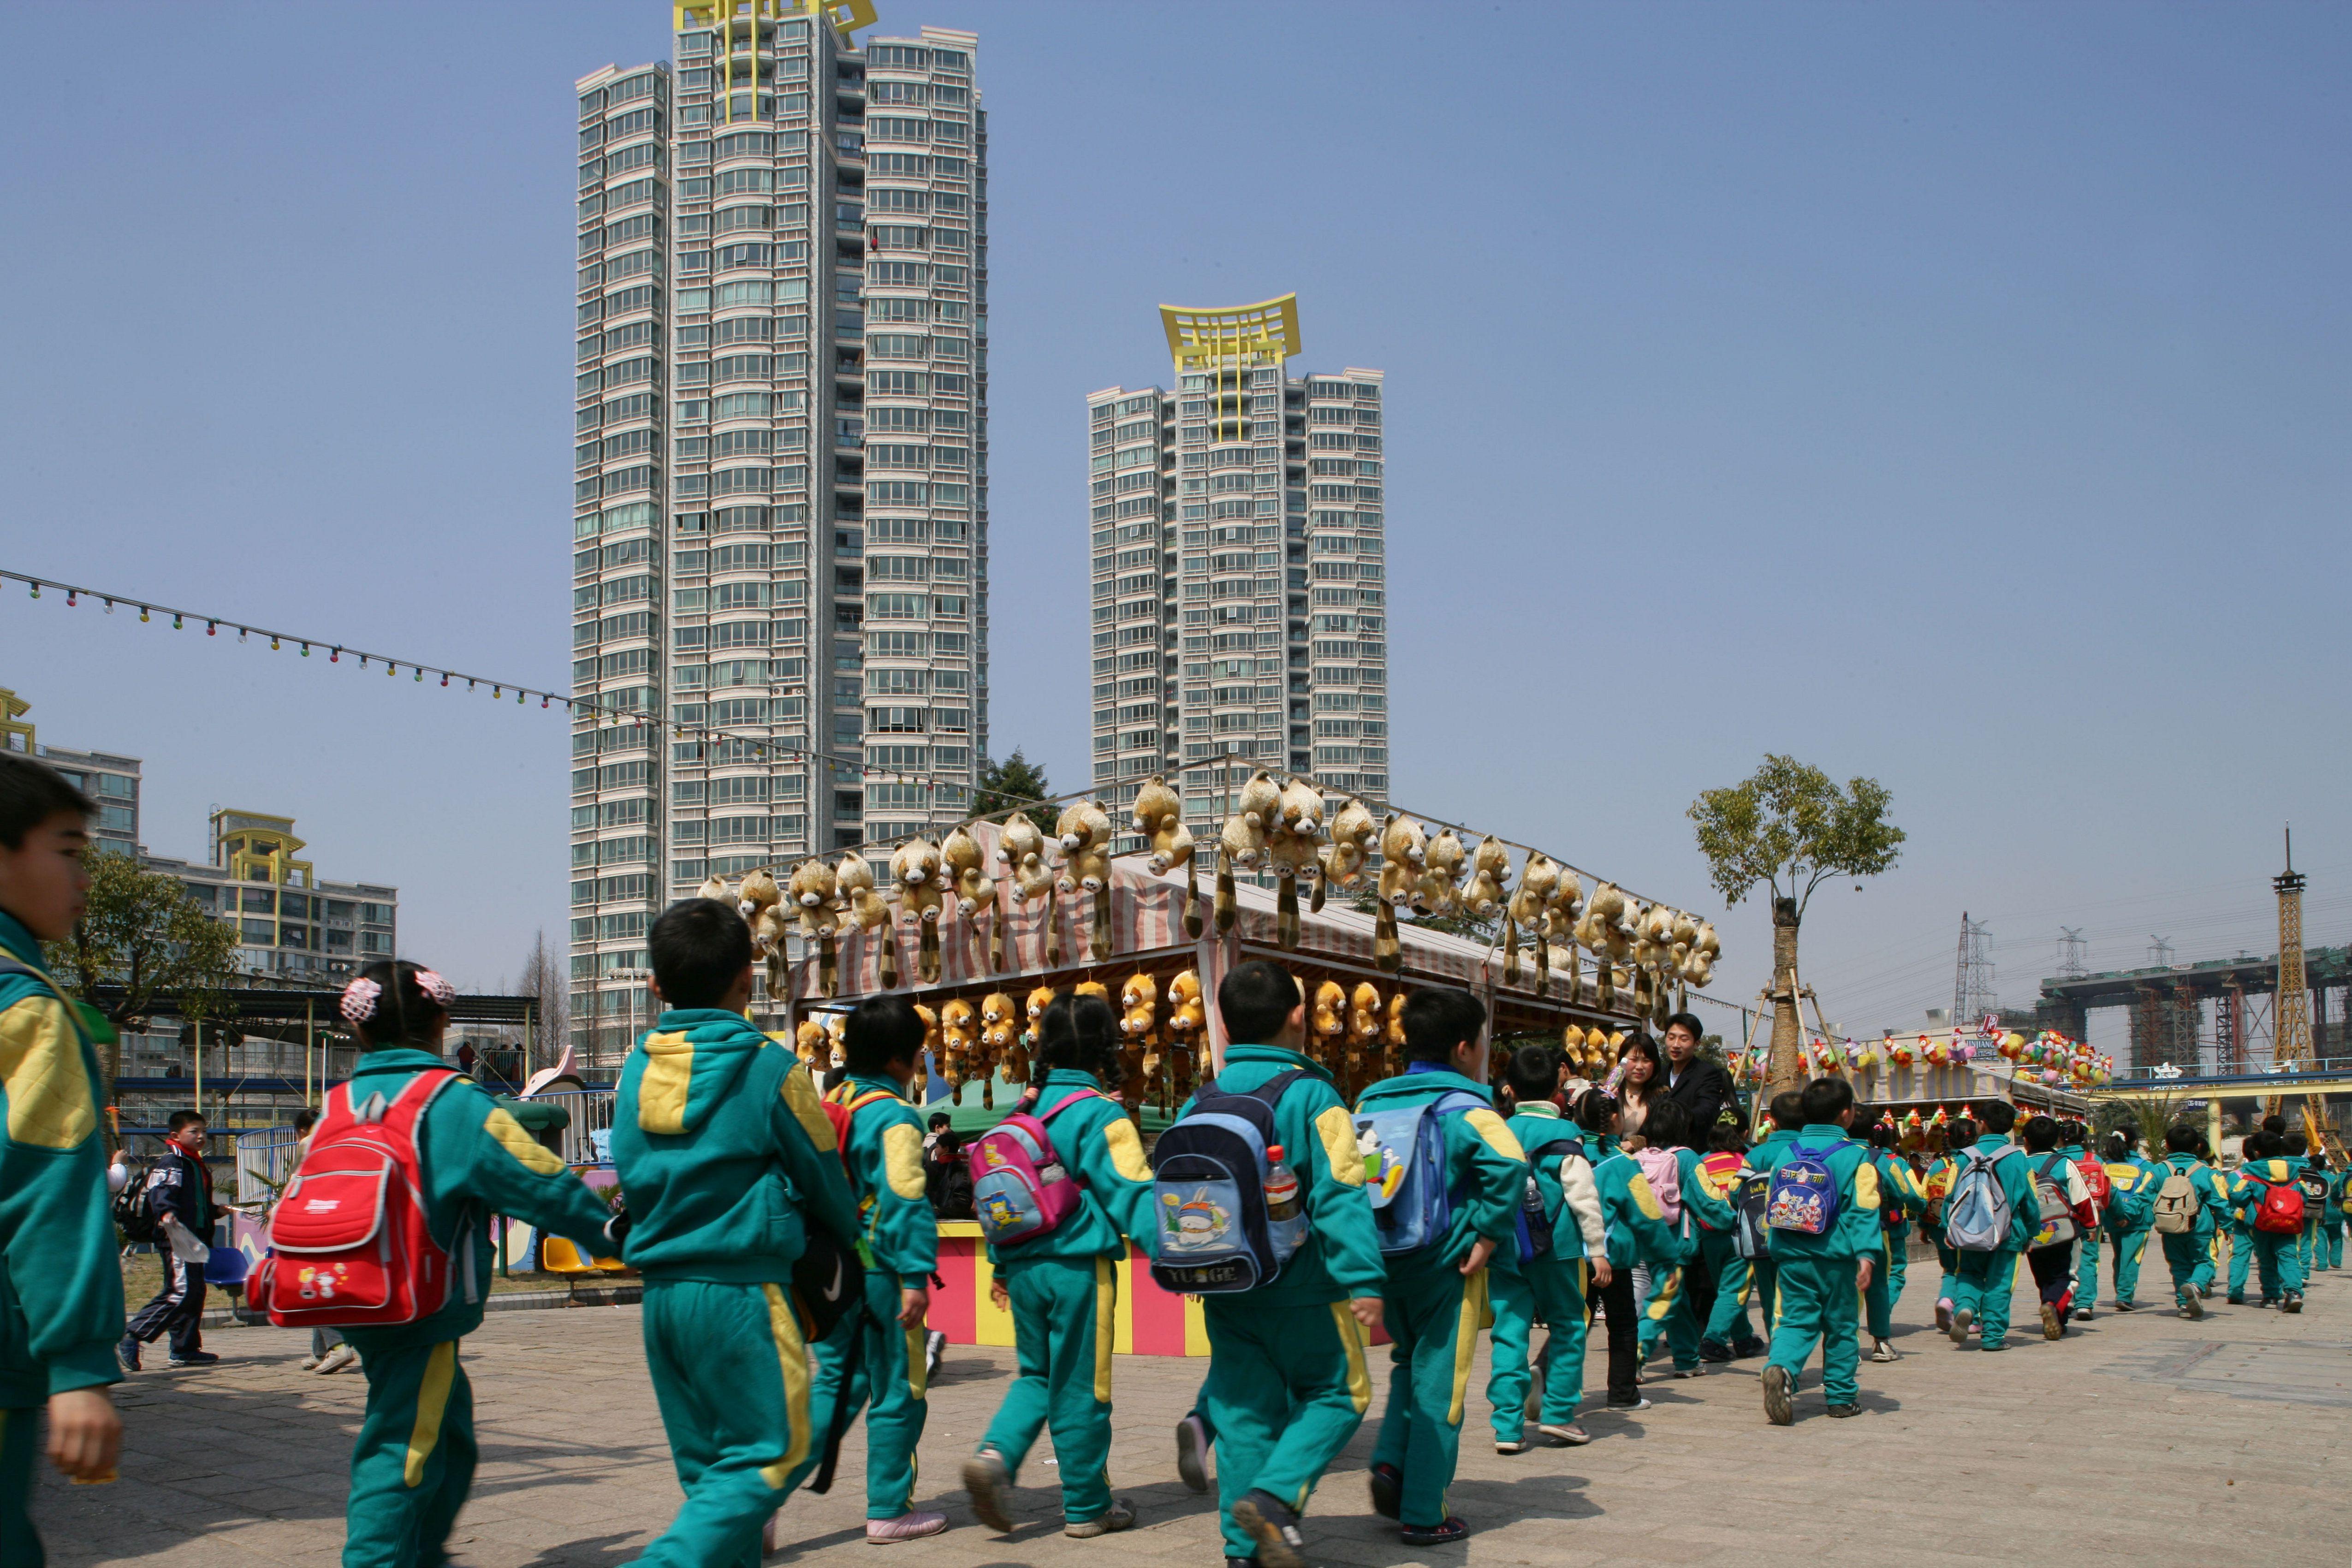 JinJiang Amusement Center, school class, fun park, excursion, row